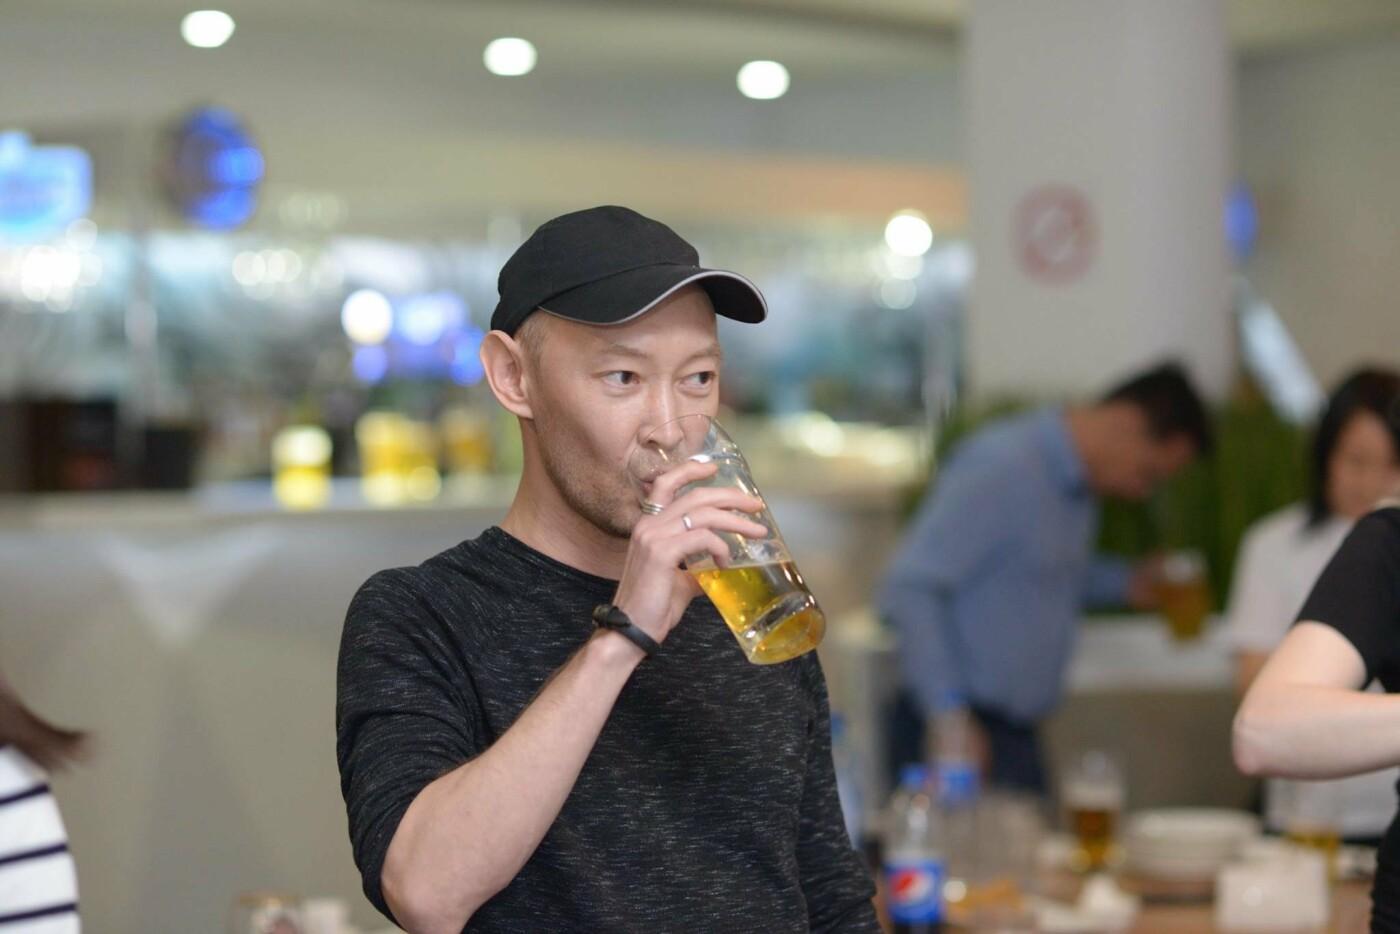 II турнир по боулингу среди журналистов прошел в Алматы (ФОТО), фото-10